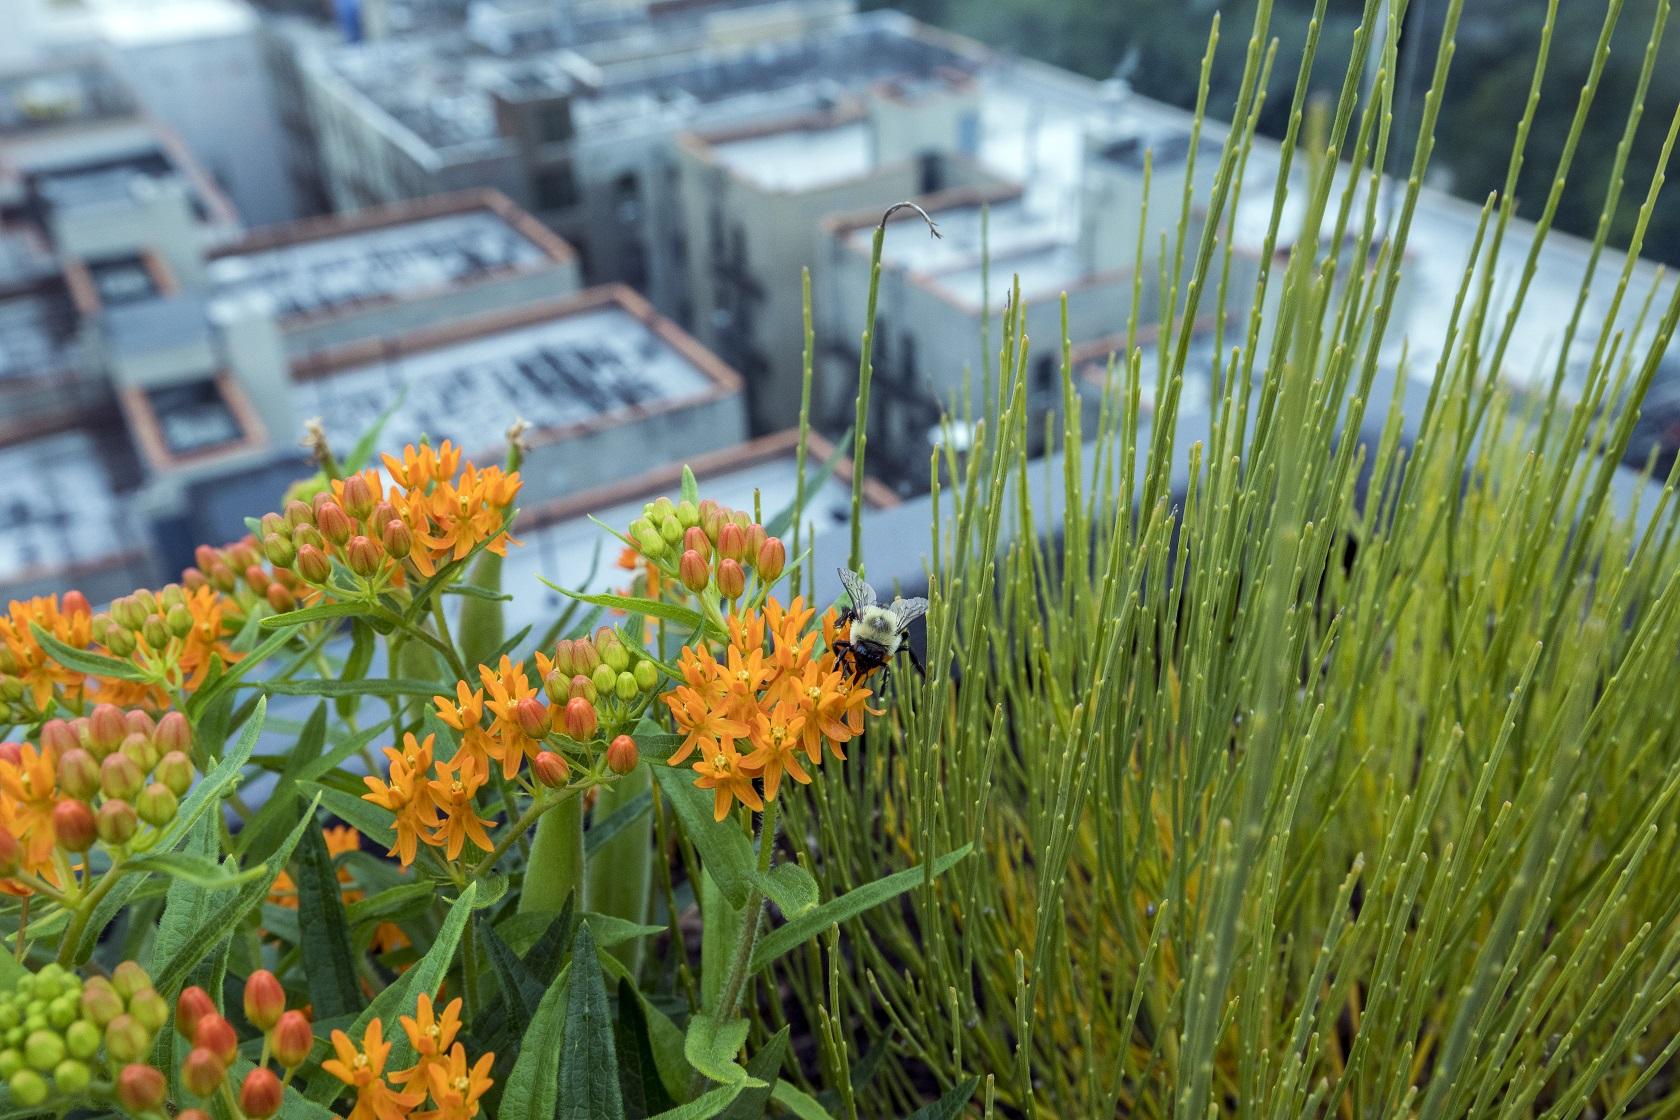 A sustainble and native plant pallette attracts pollinators